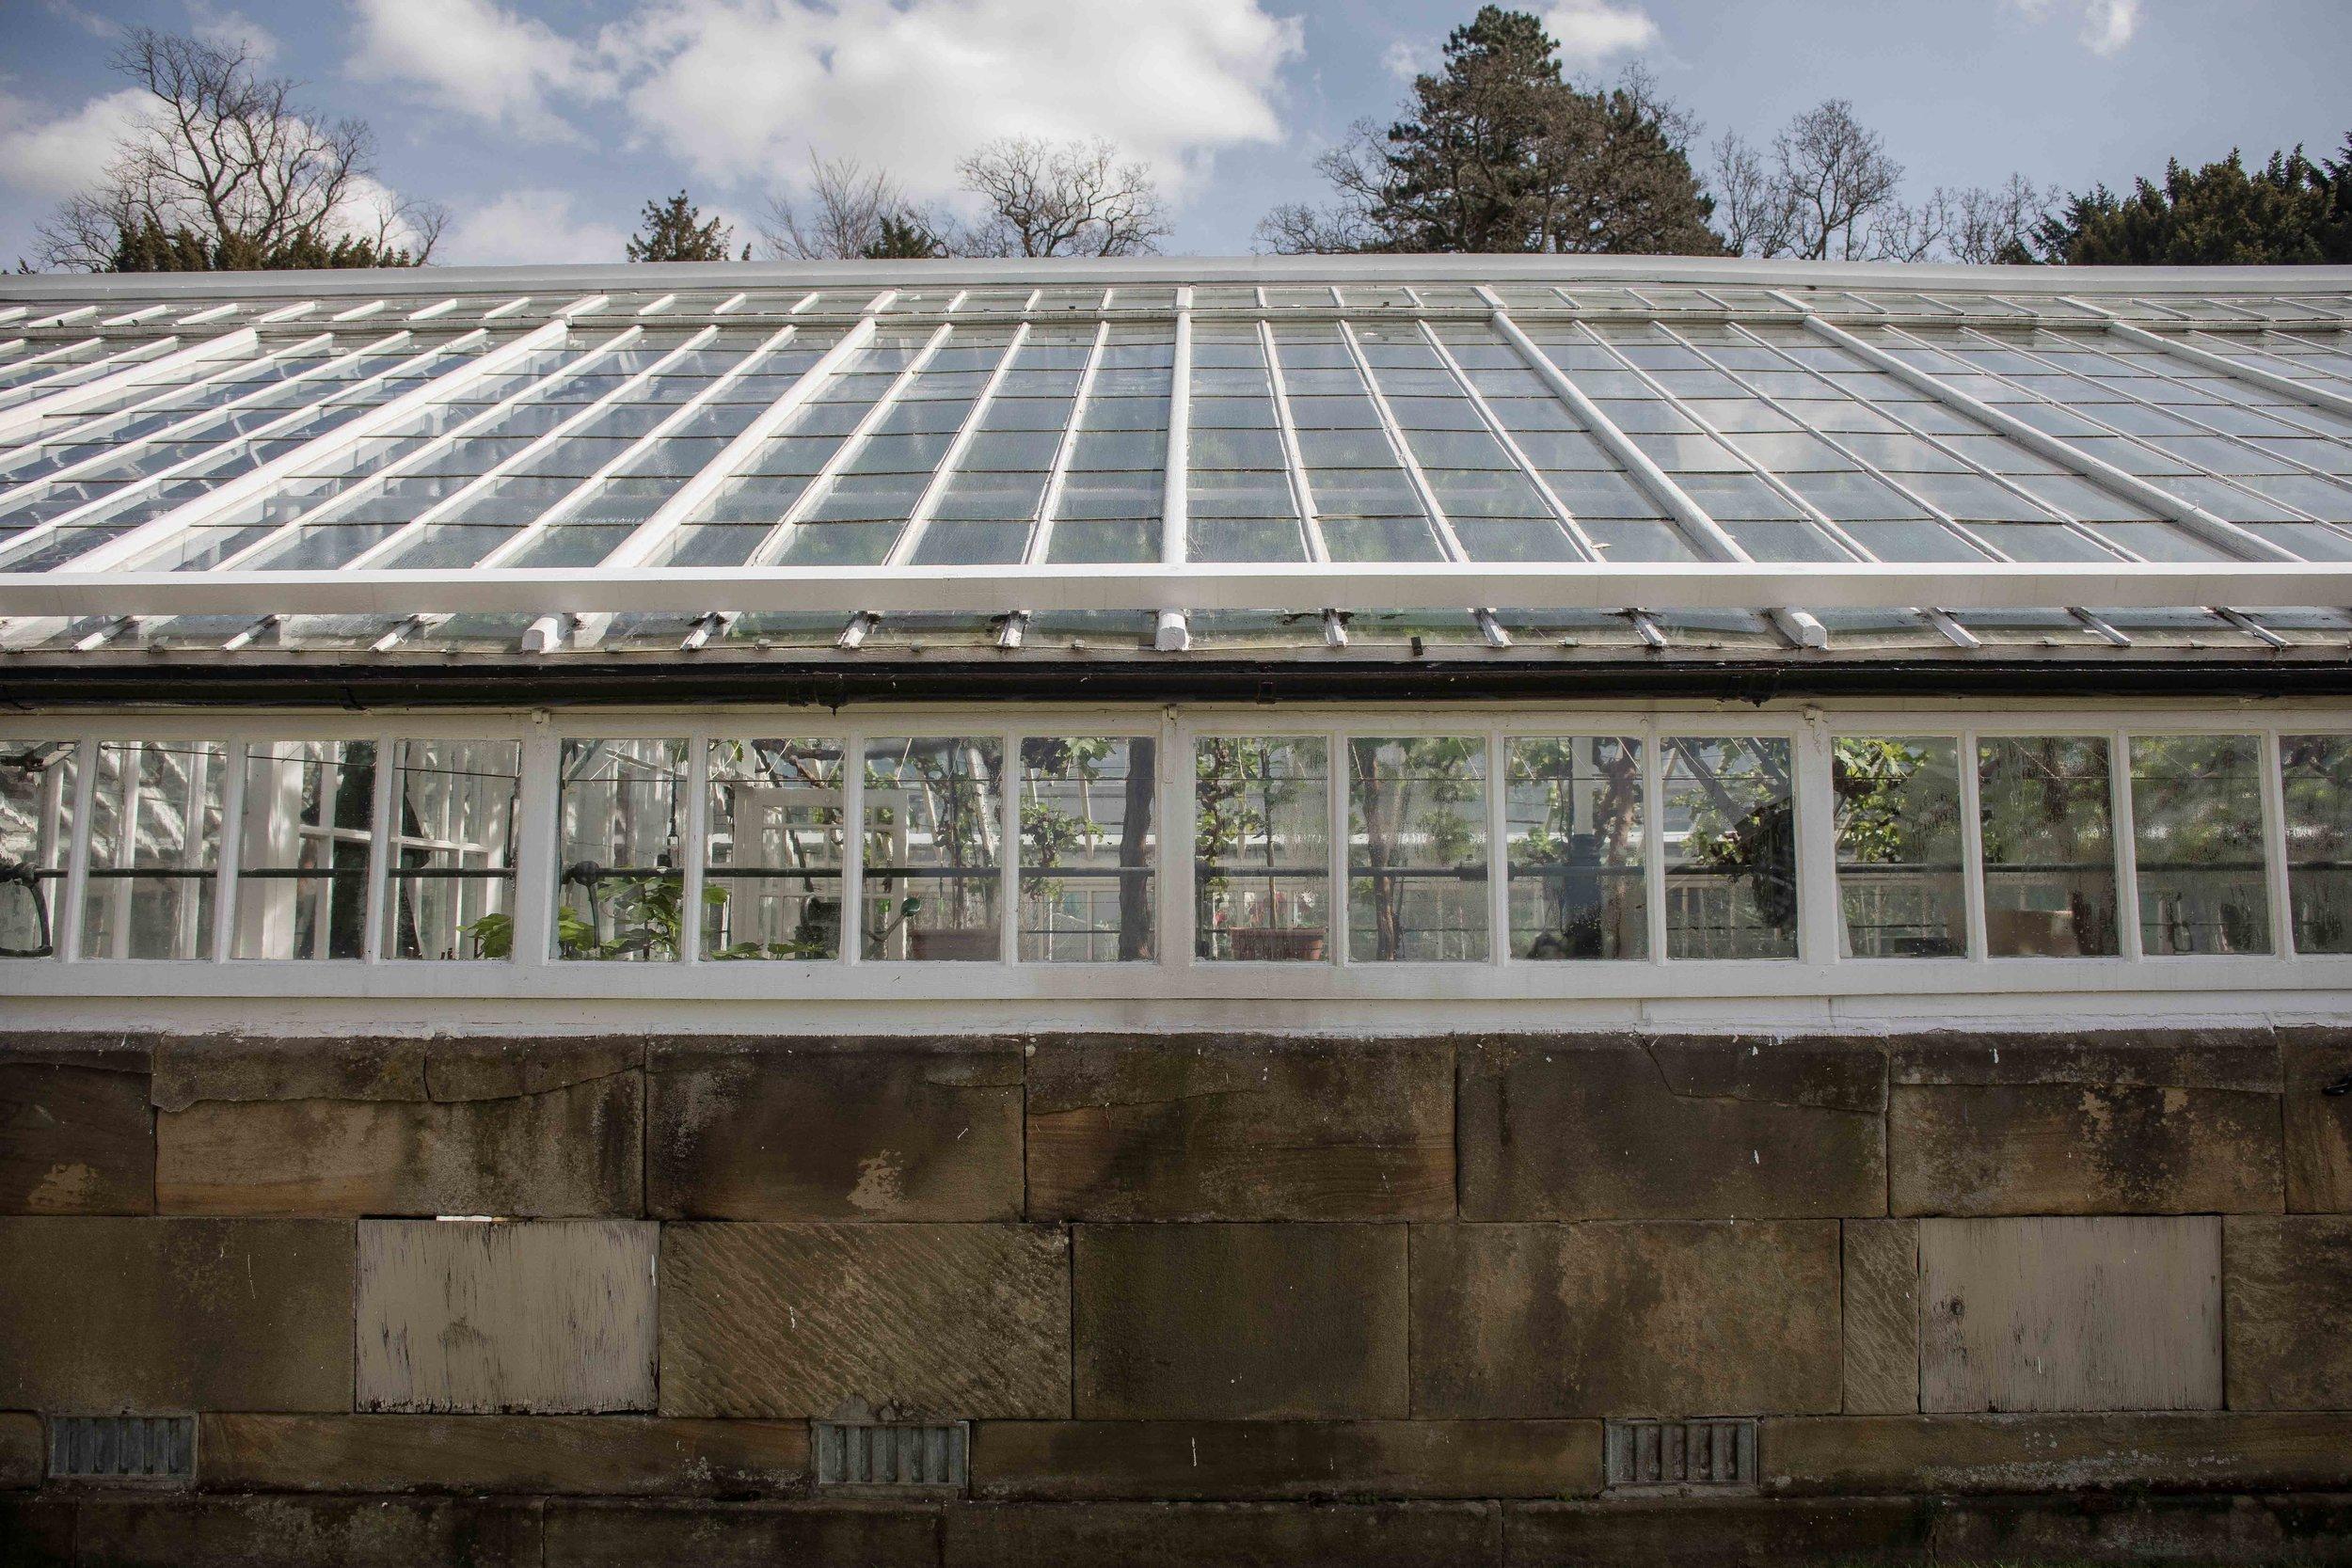 Chatsworth House Vinery built around 1834 by Joseph Paxton